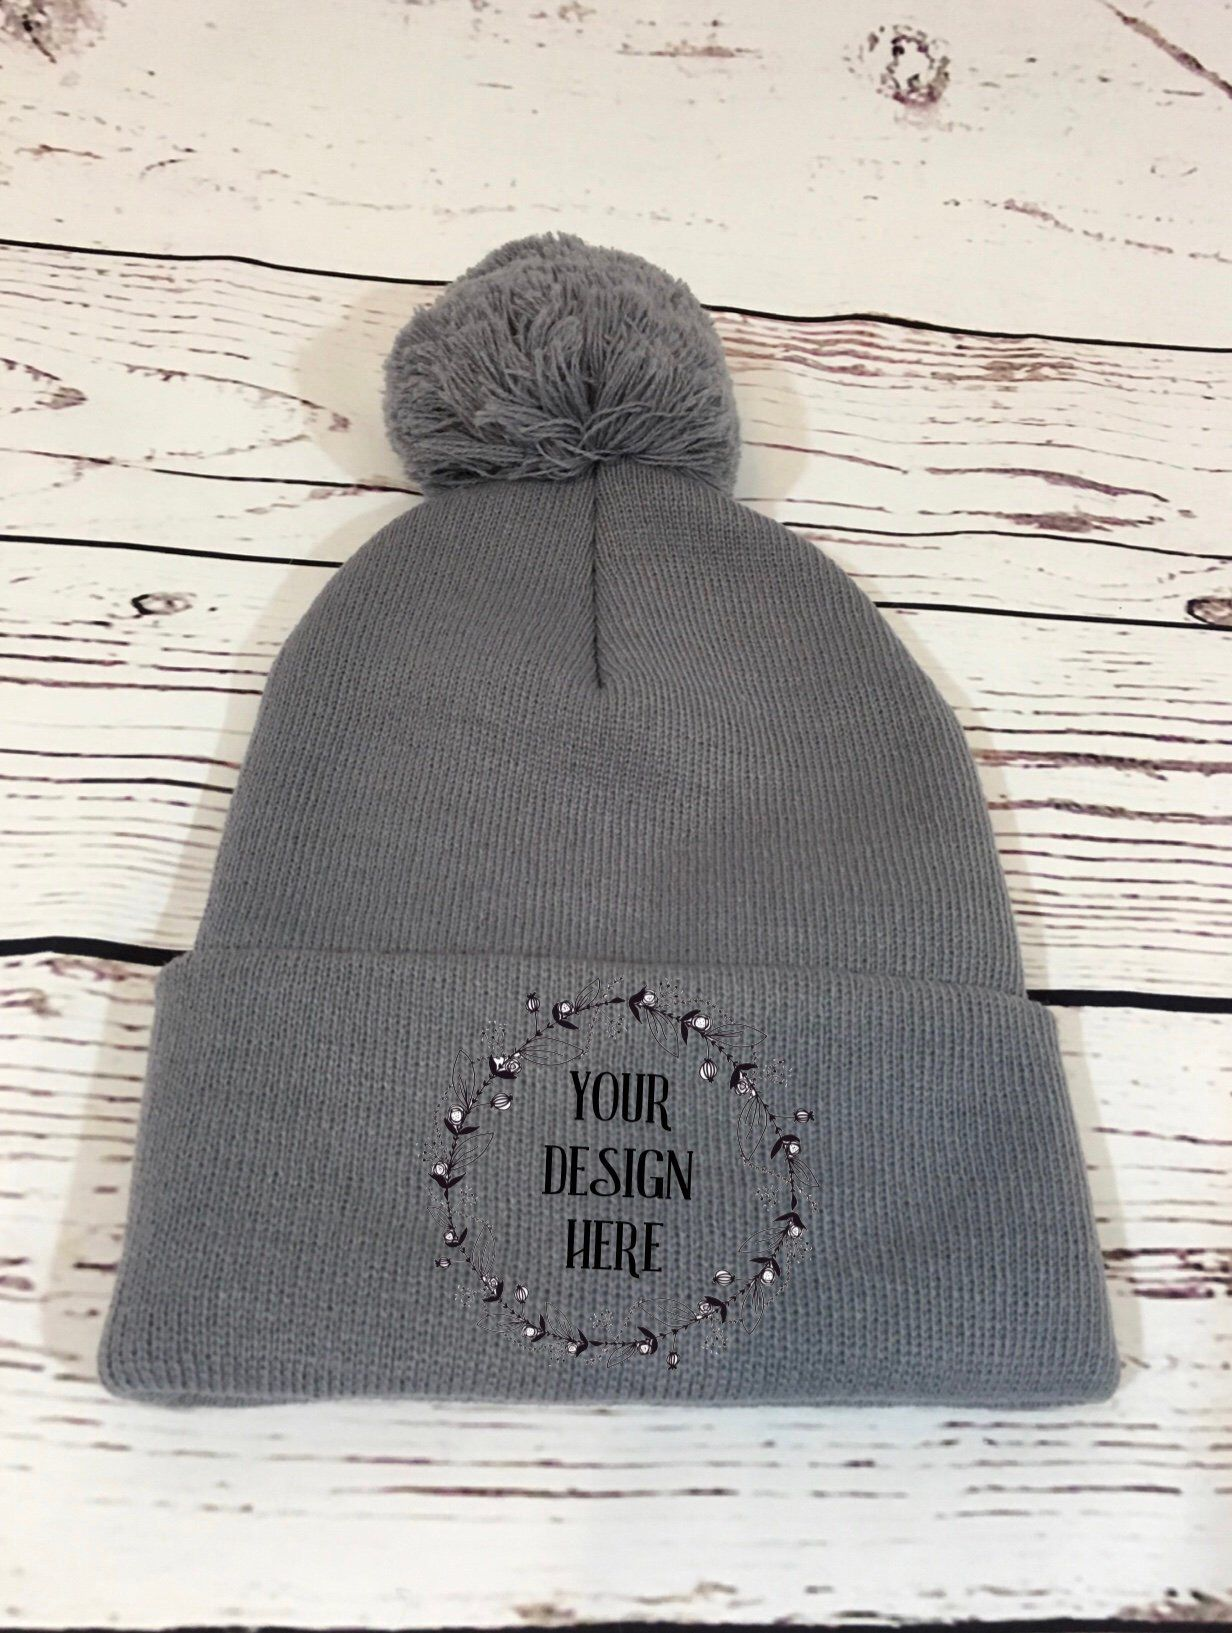 Grey Pom Pom Hat Mockup   Grey Knit Hat Mockup   Grey Hat